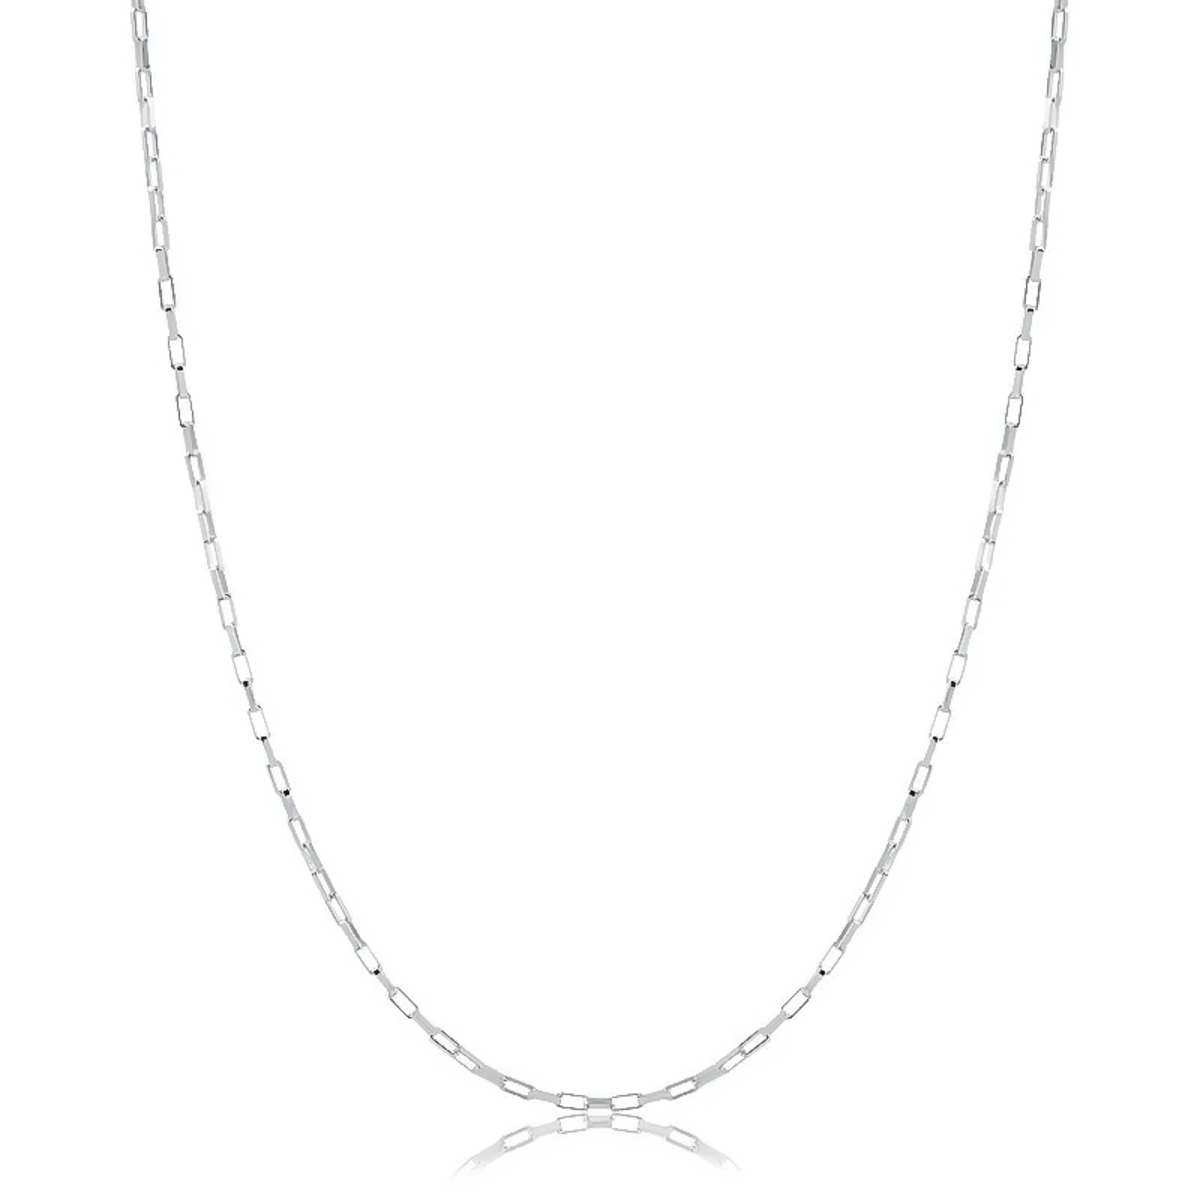 Corrente Masculina Cartier 60 cm - Prata 925